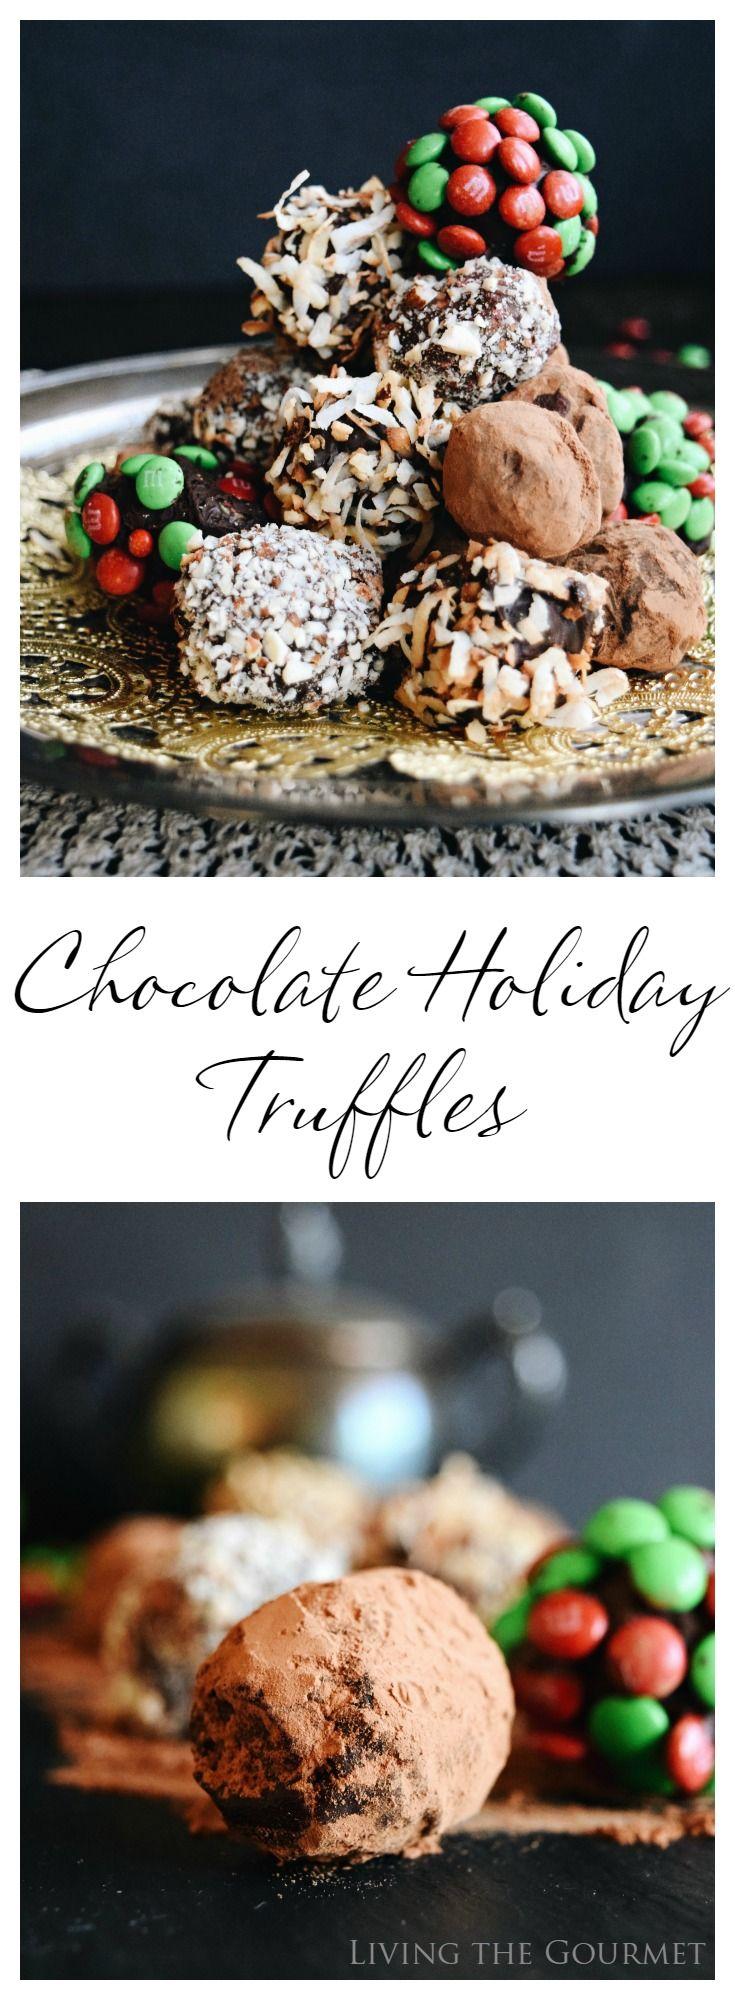 Living the Gourmet: Chocolate Holiday Truffles | #SweetSquad #BakeInTheFun #Ad @walmart